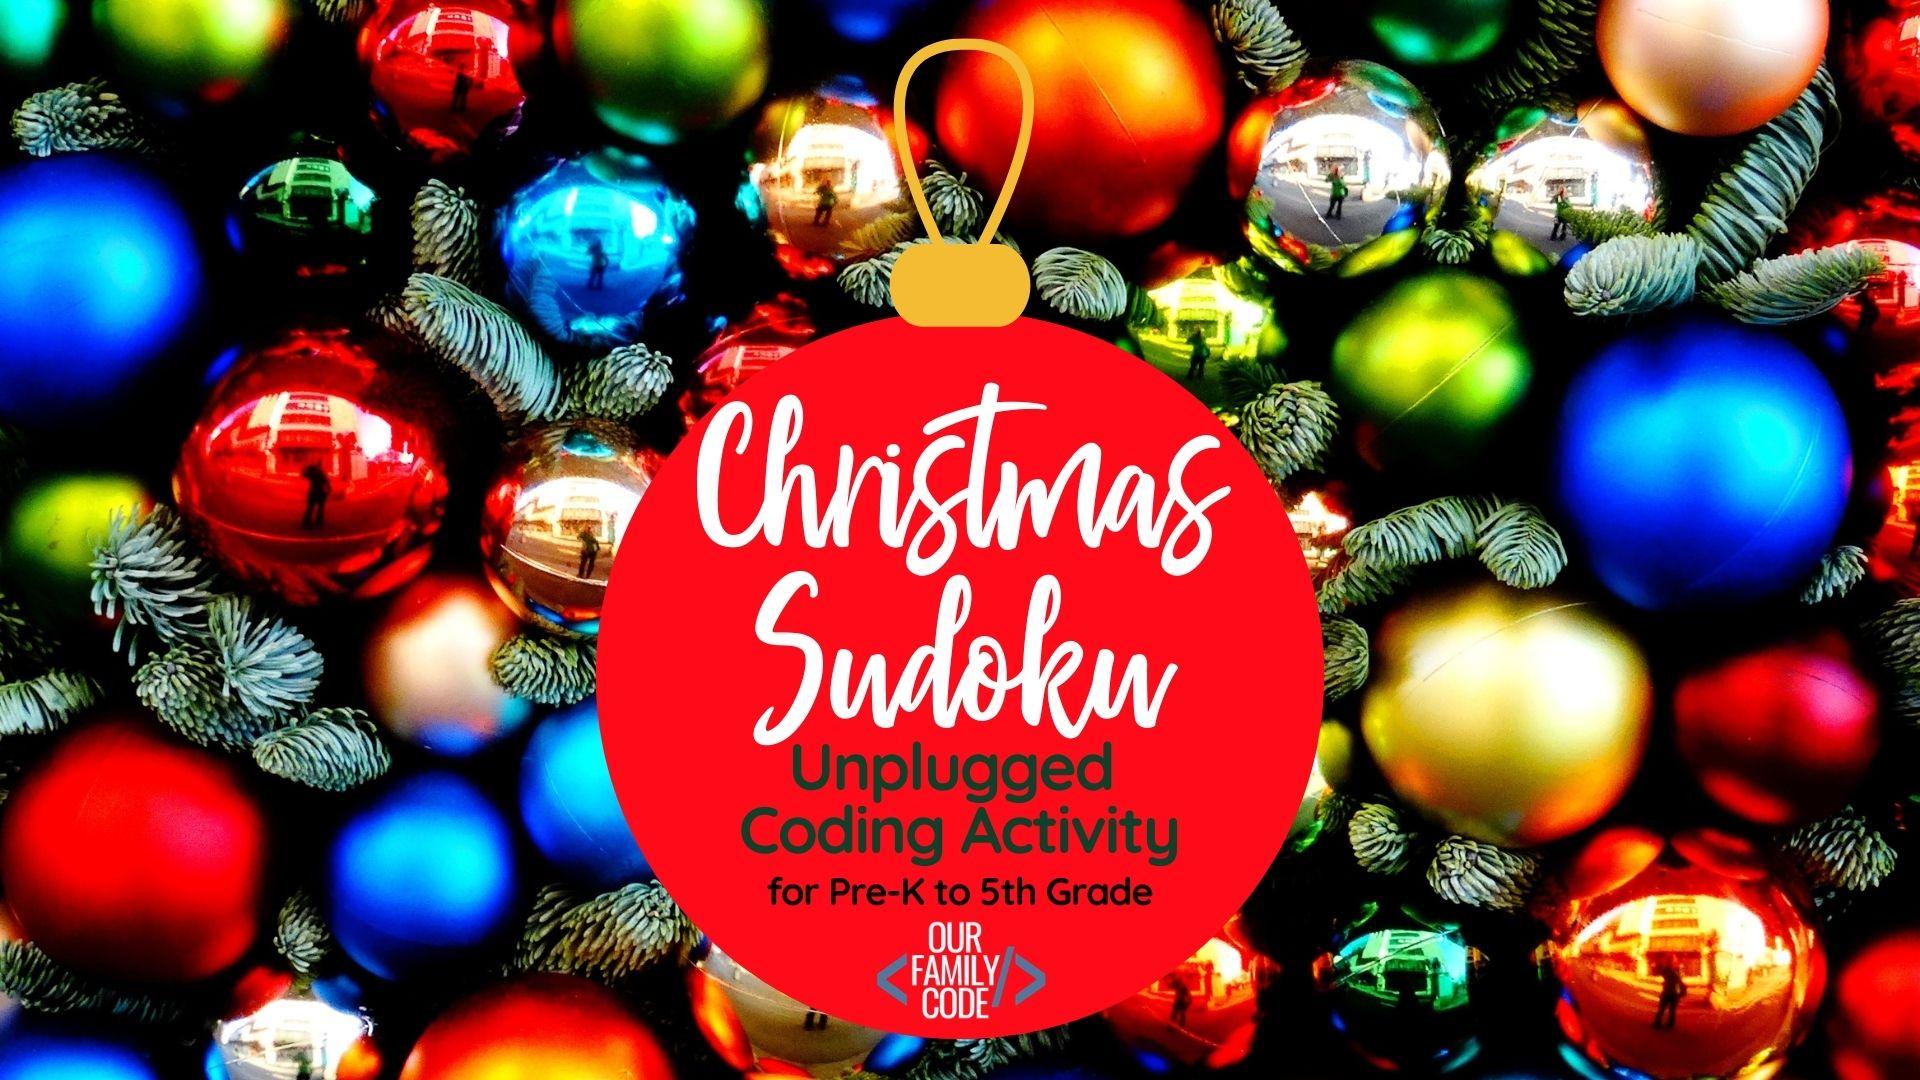 K On Christmas.Christmas Sudoku Logical Reasoning Activity For Kids